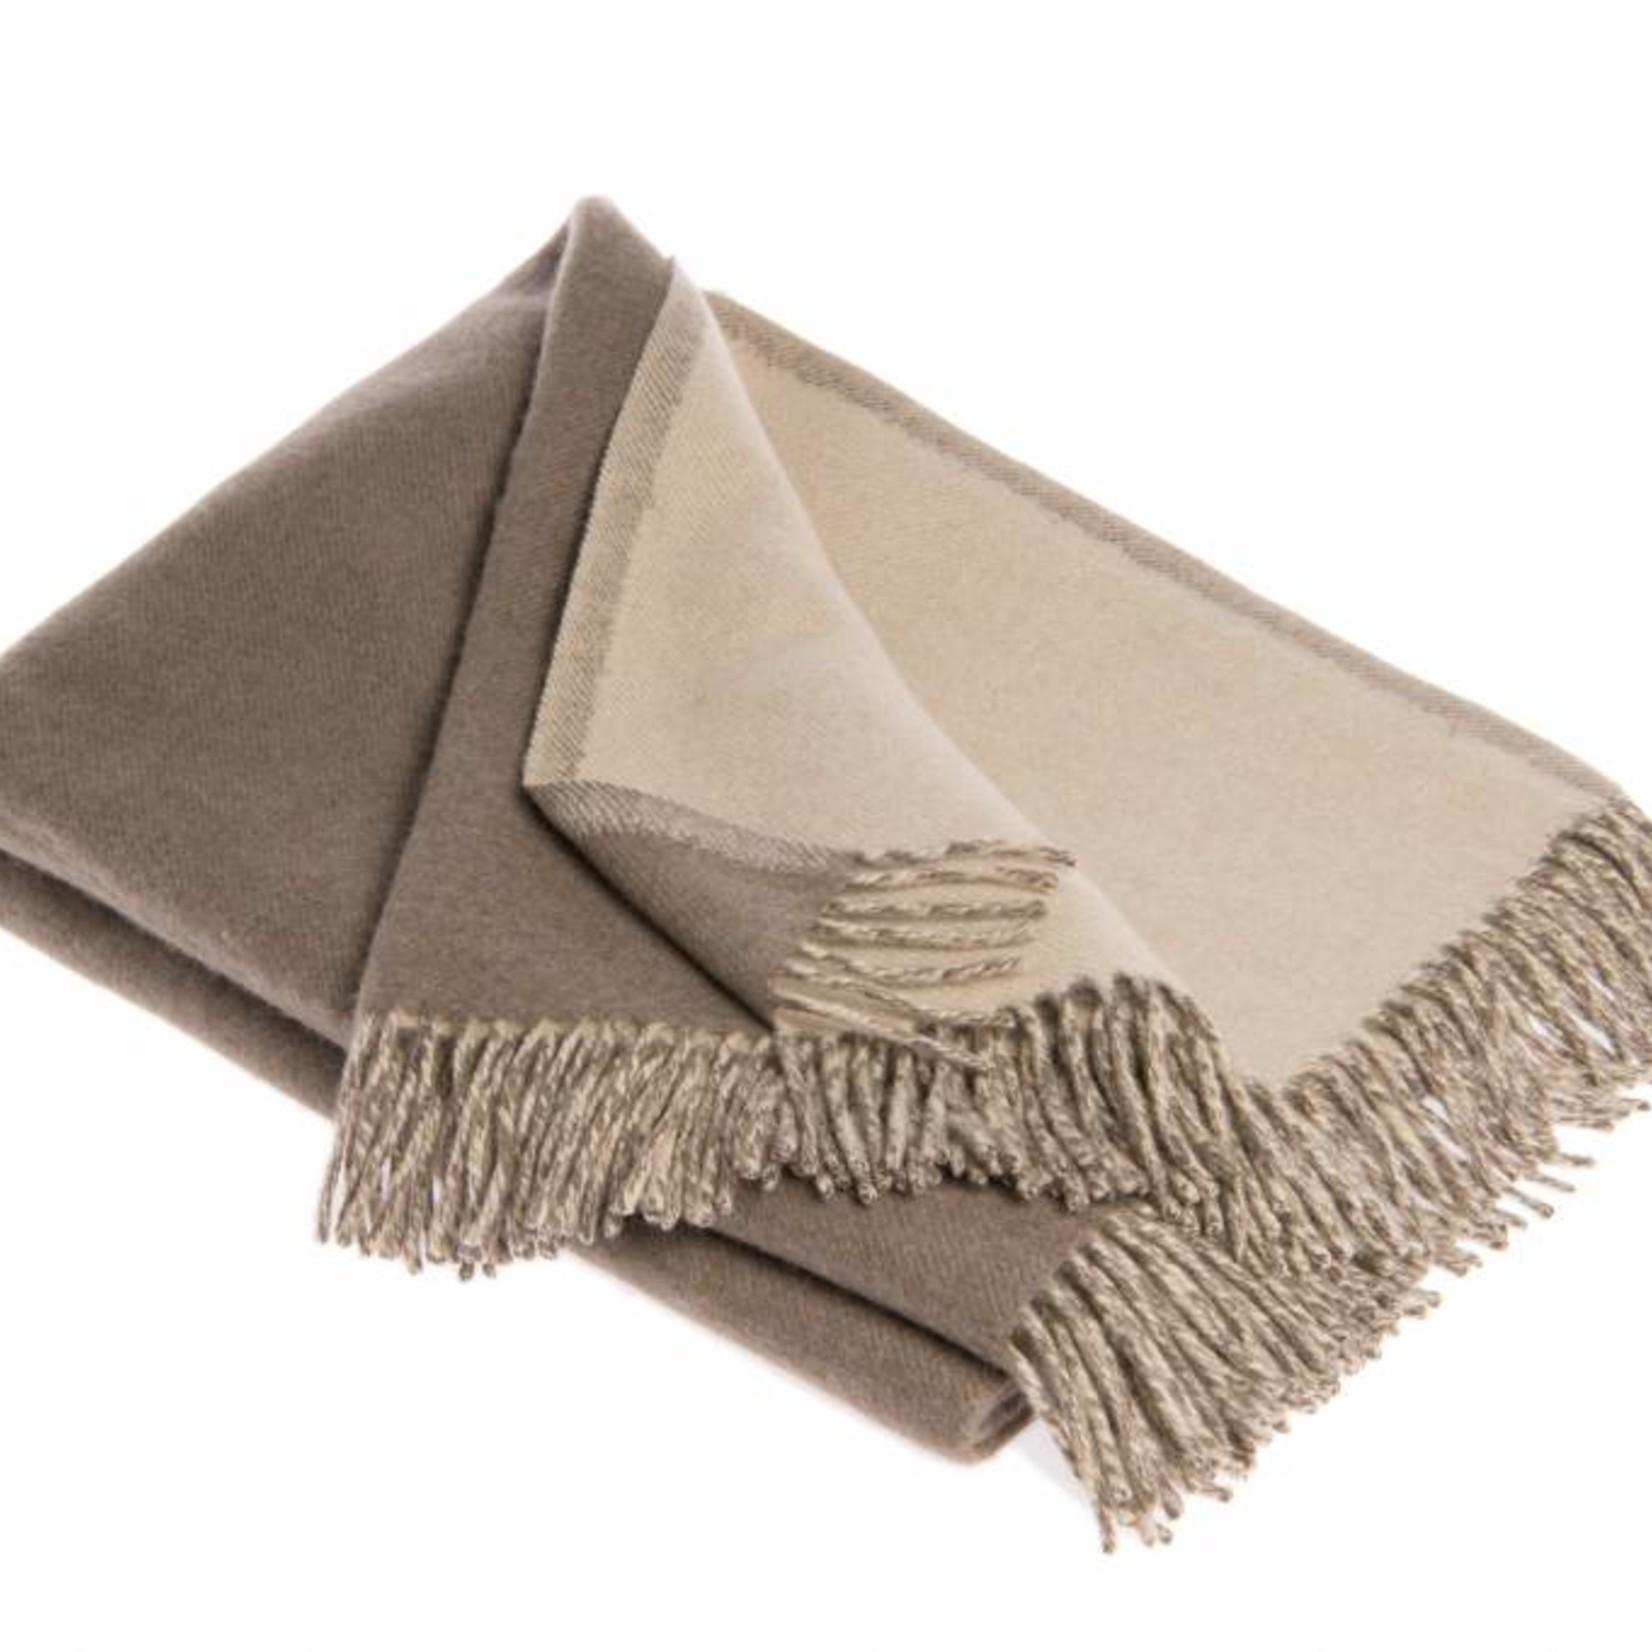 Yangir - Decke aus Kaschmir - zweifarbig